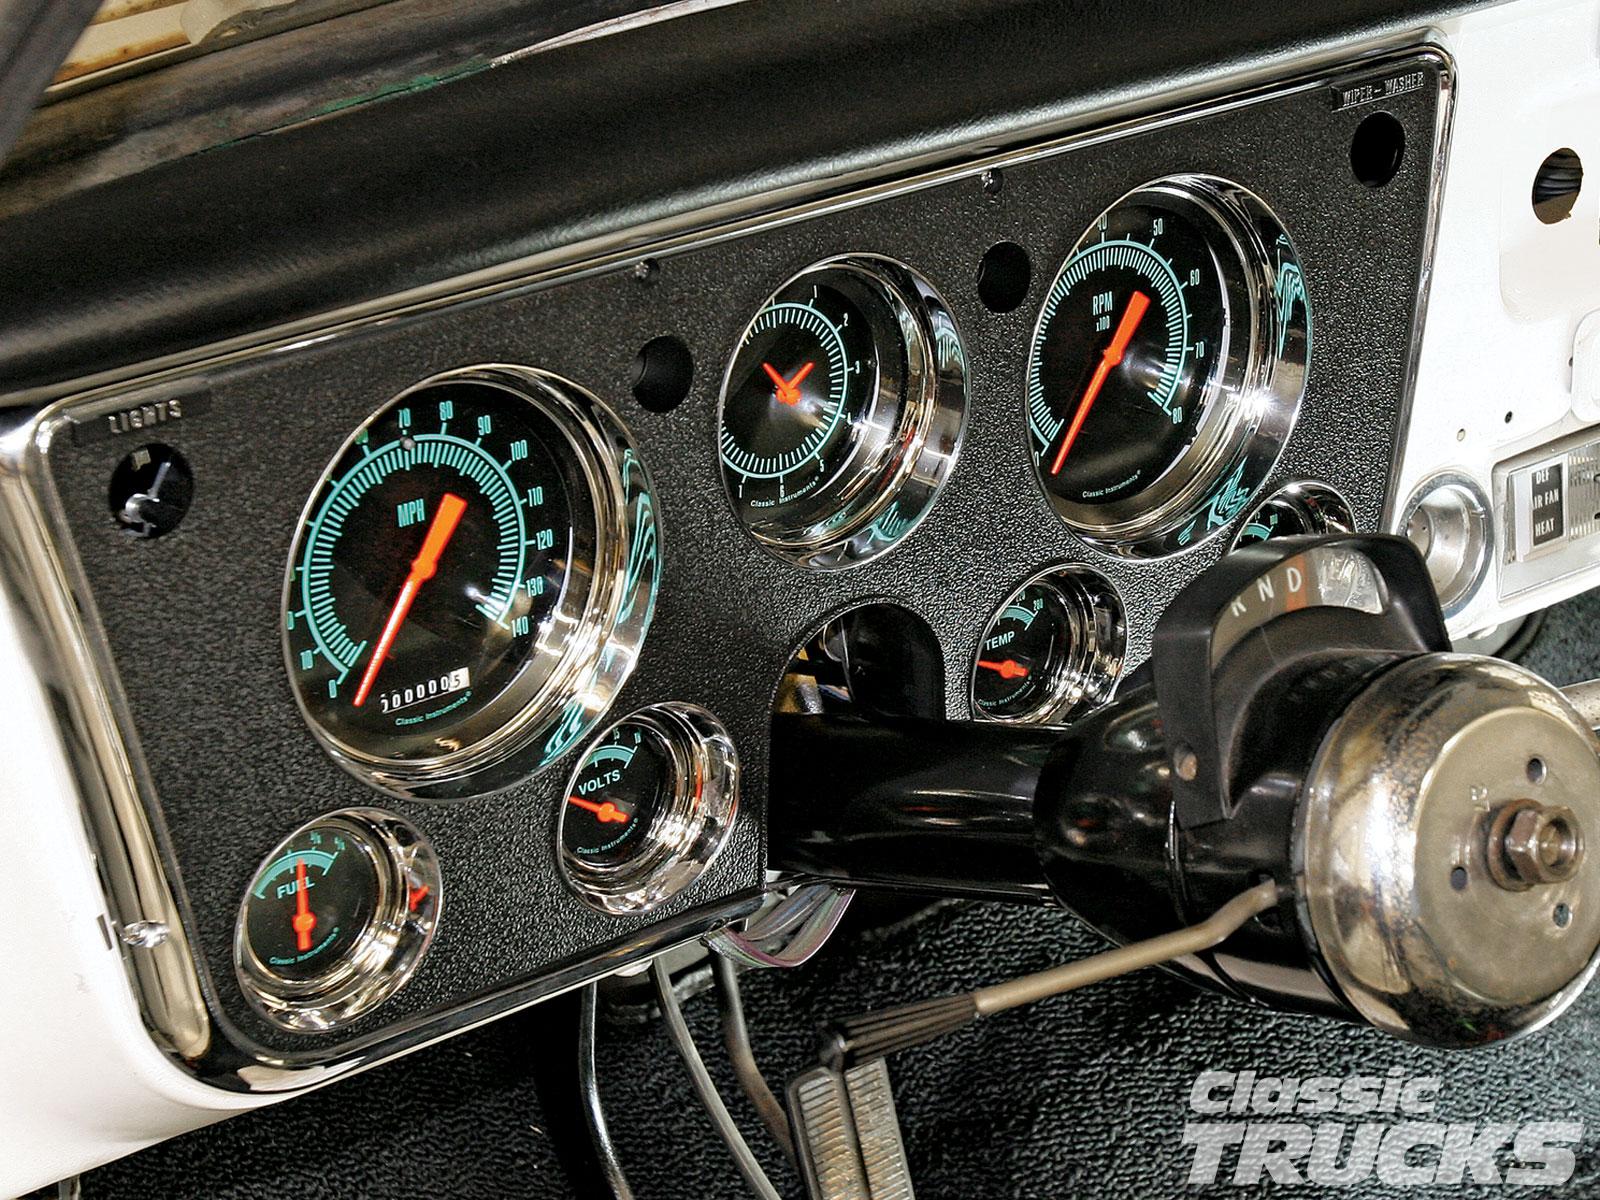 1972 chevy truck dash wiring diagram culligan water softener parts 1969 c10 tachometer 34